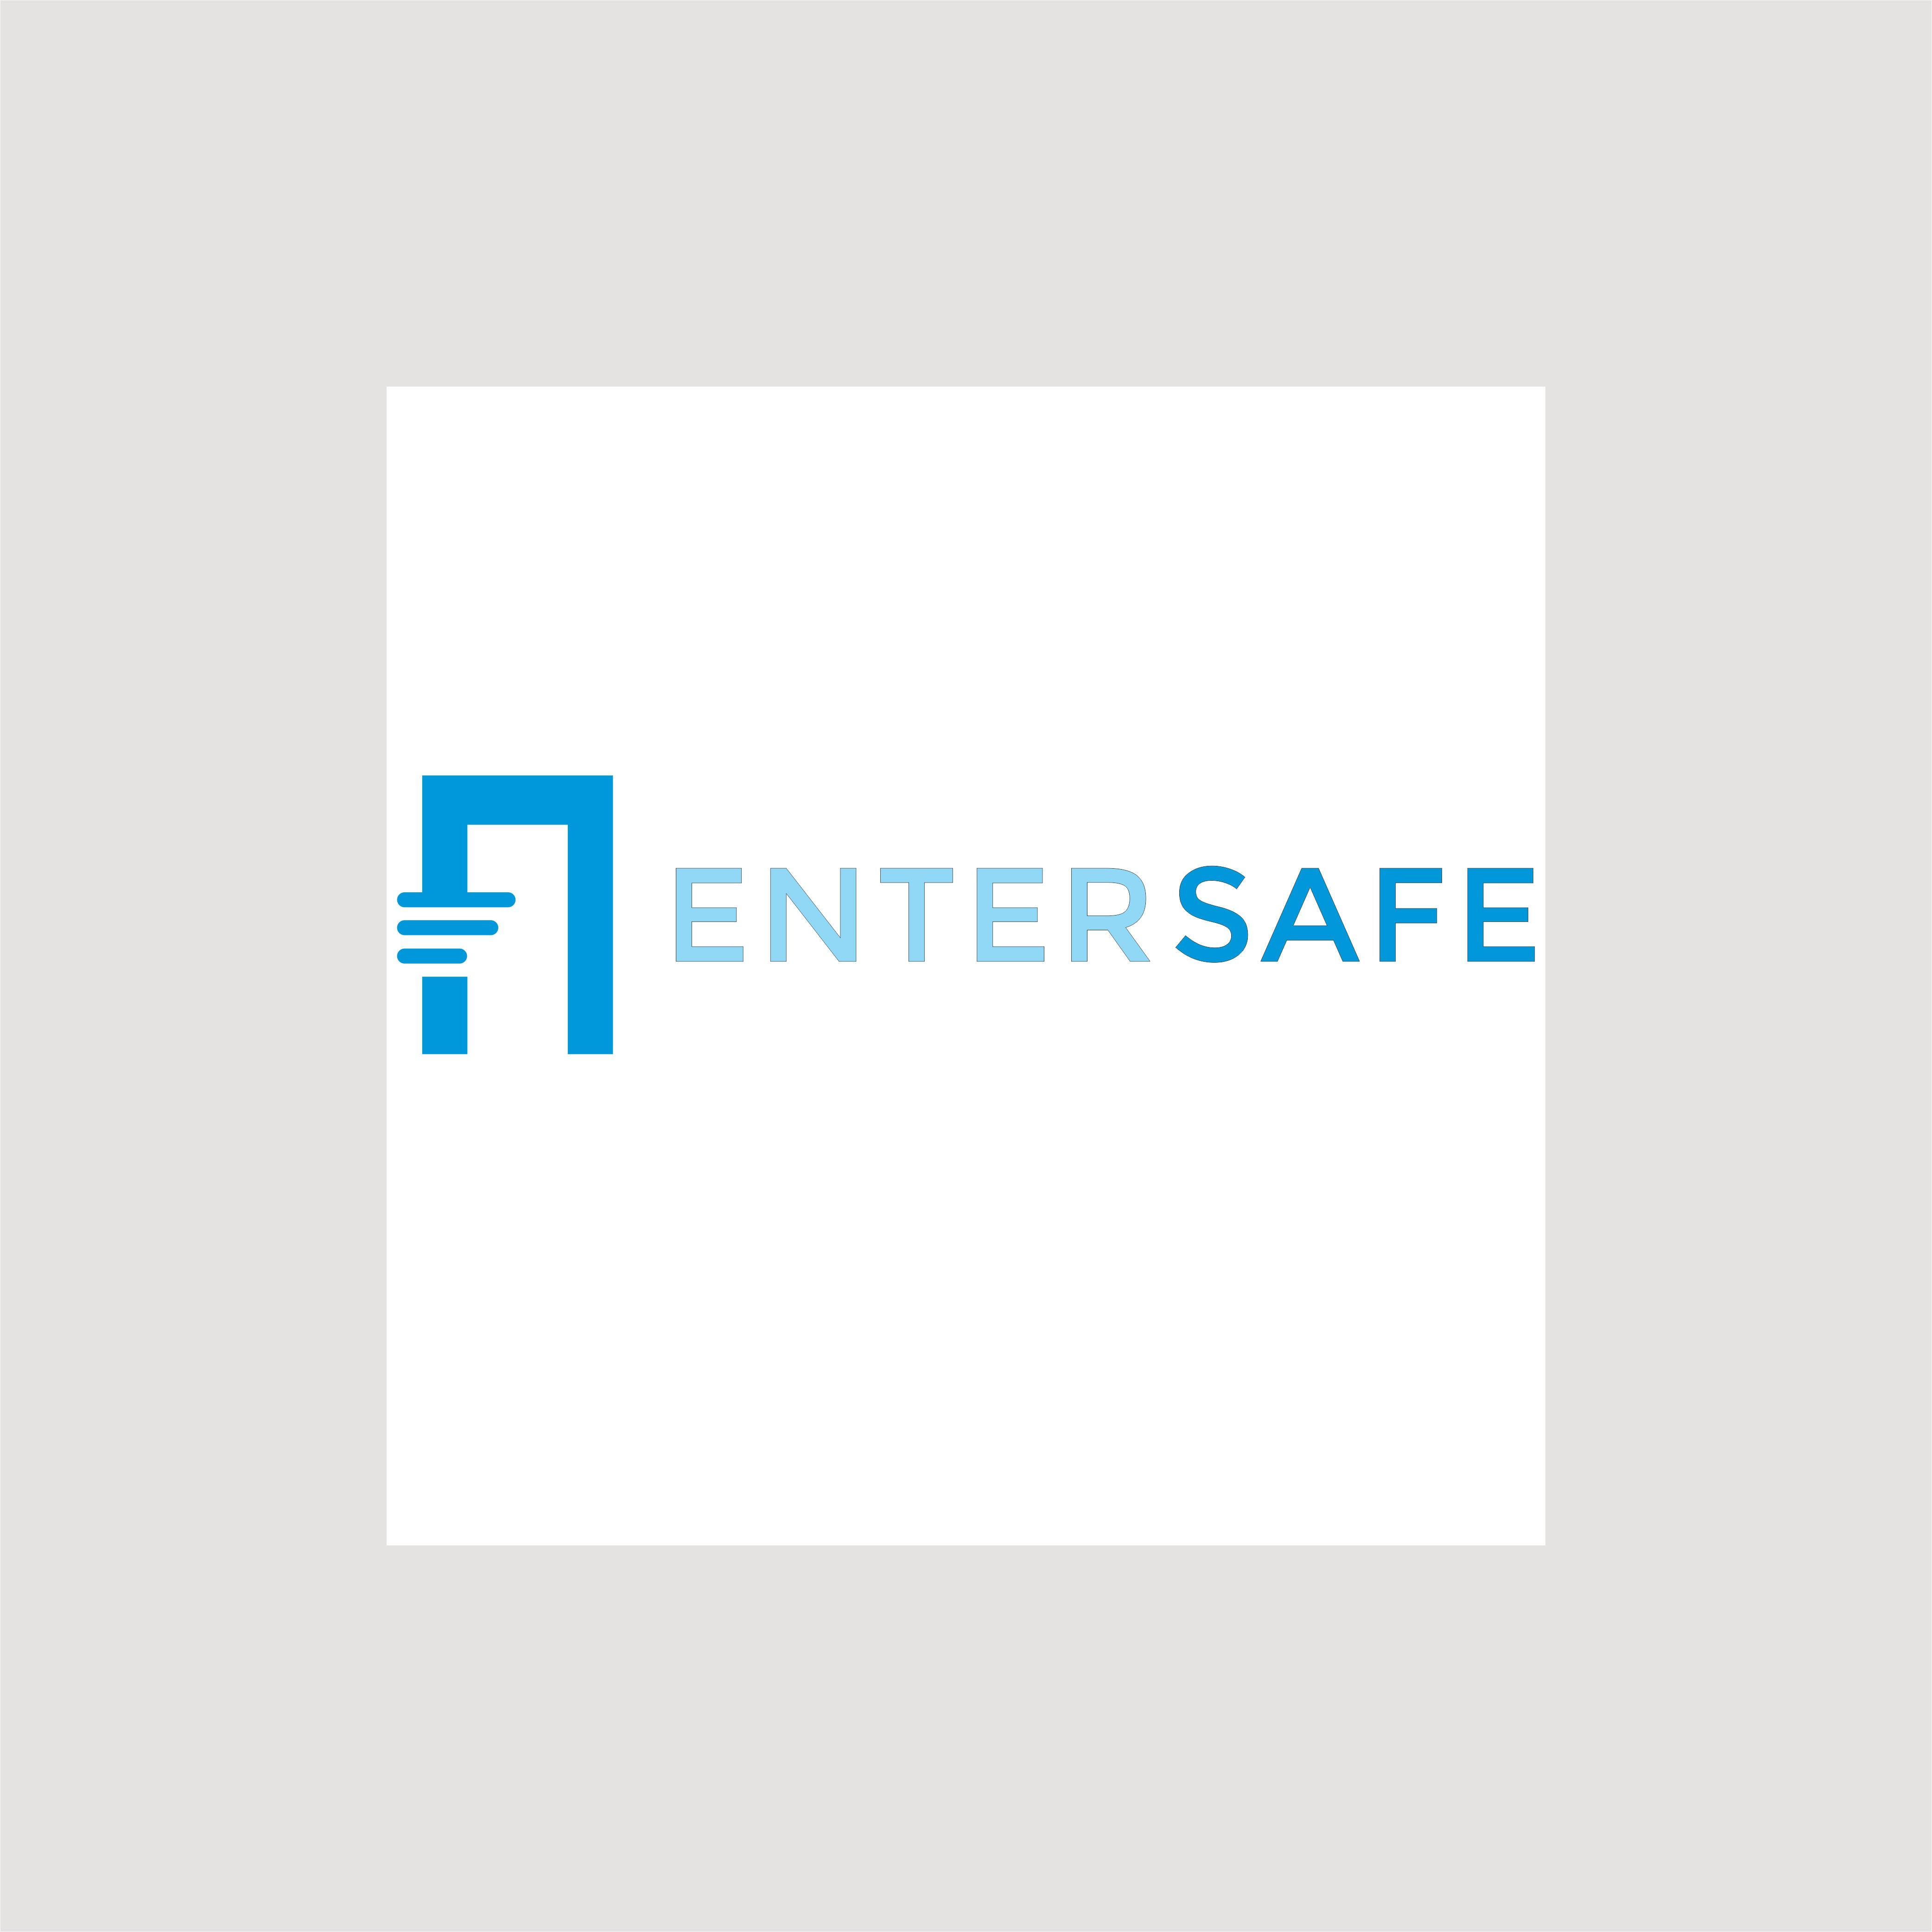 Eco Friendly Company Flat Logo Design